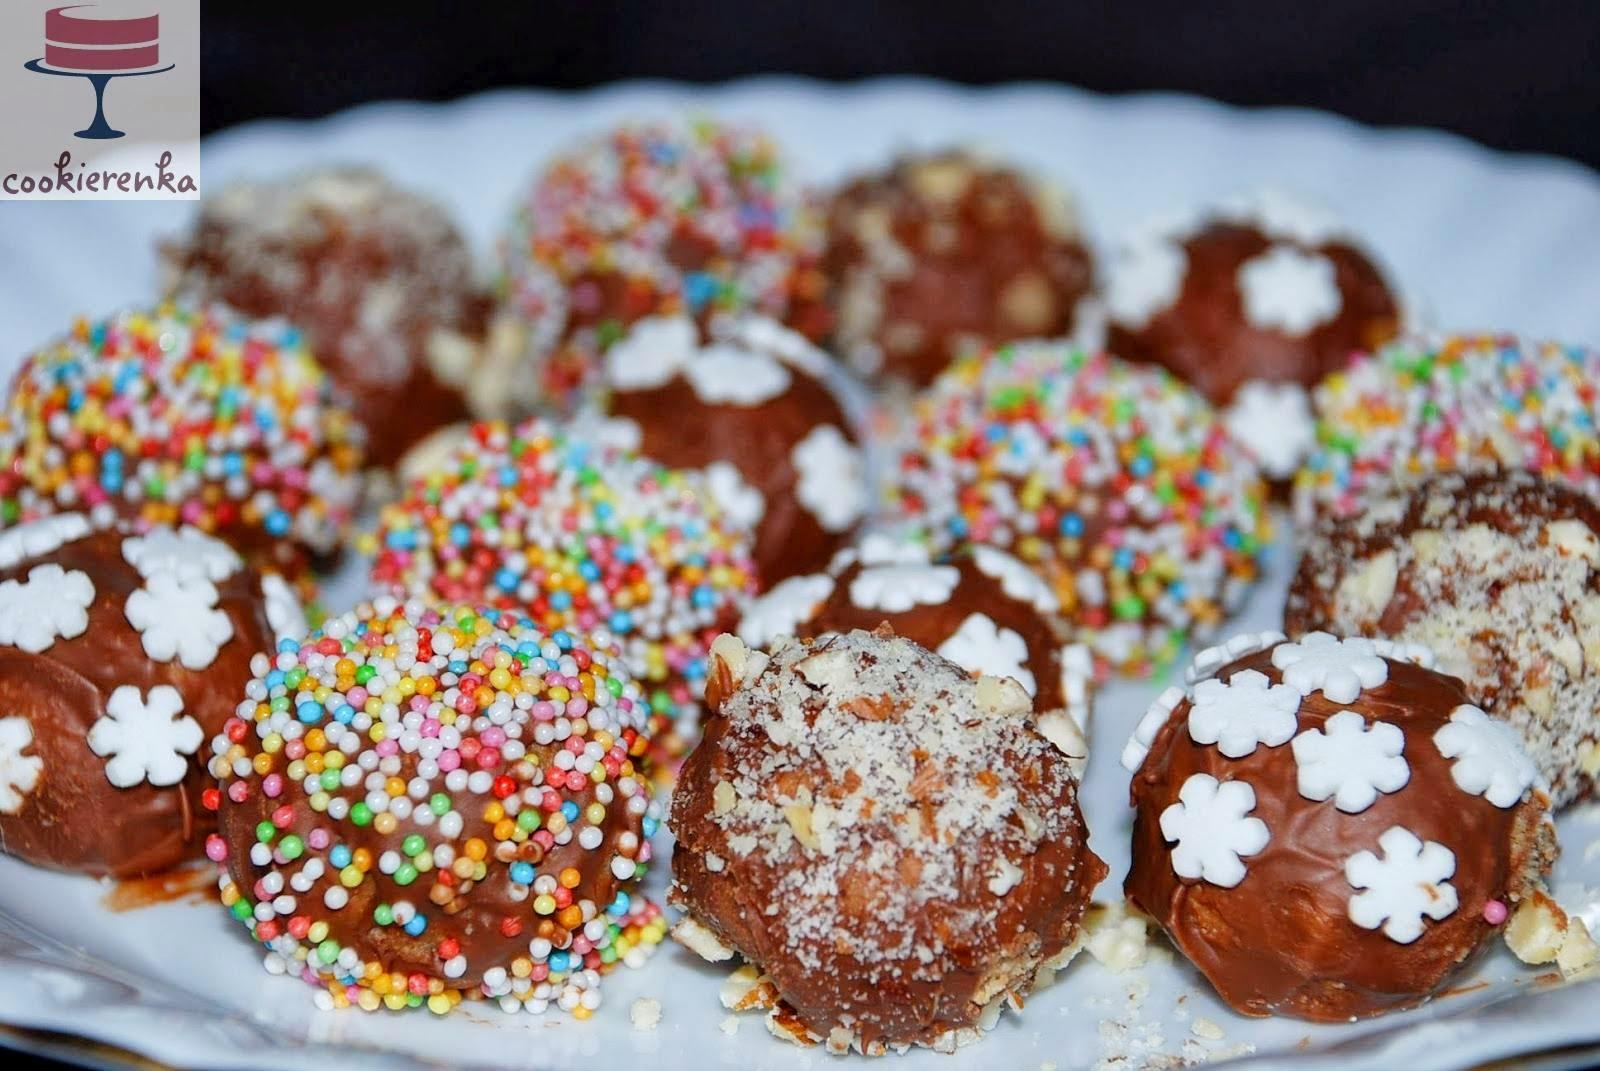 http://www.cookierenka.com/2013/11/trufle-piernikowe.html